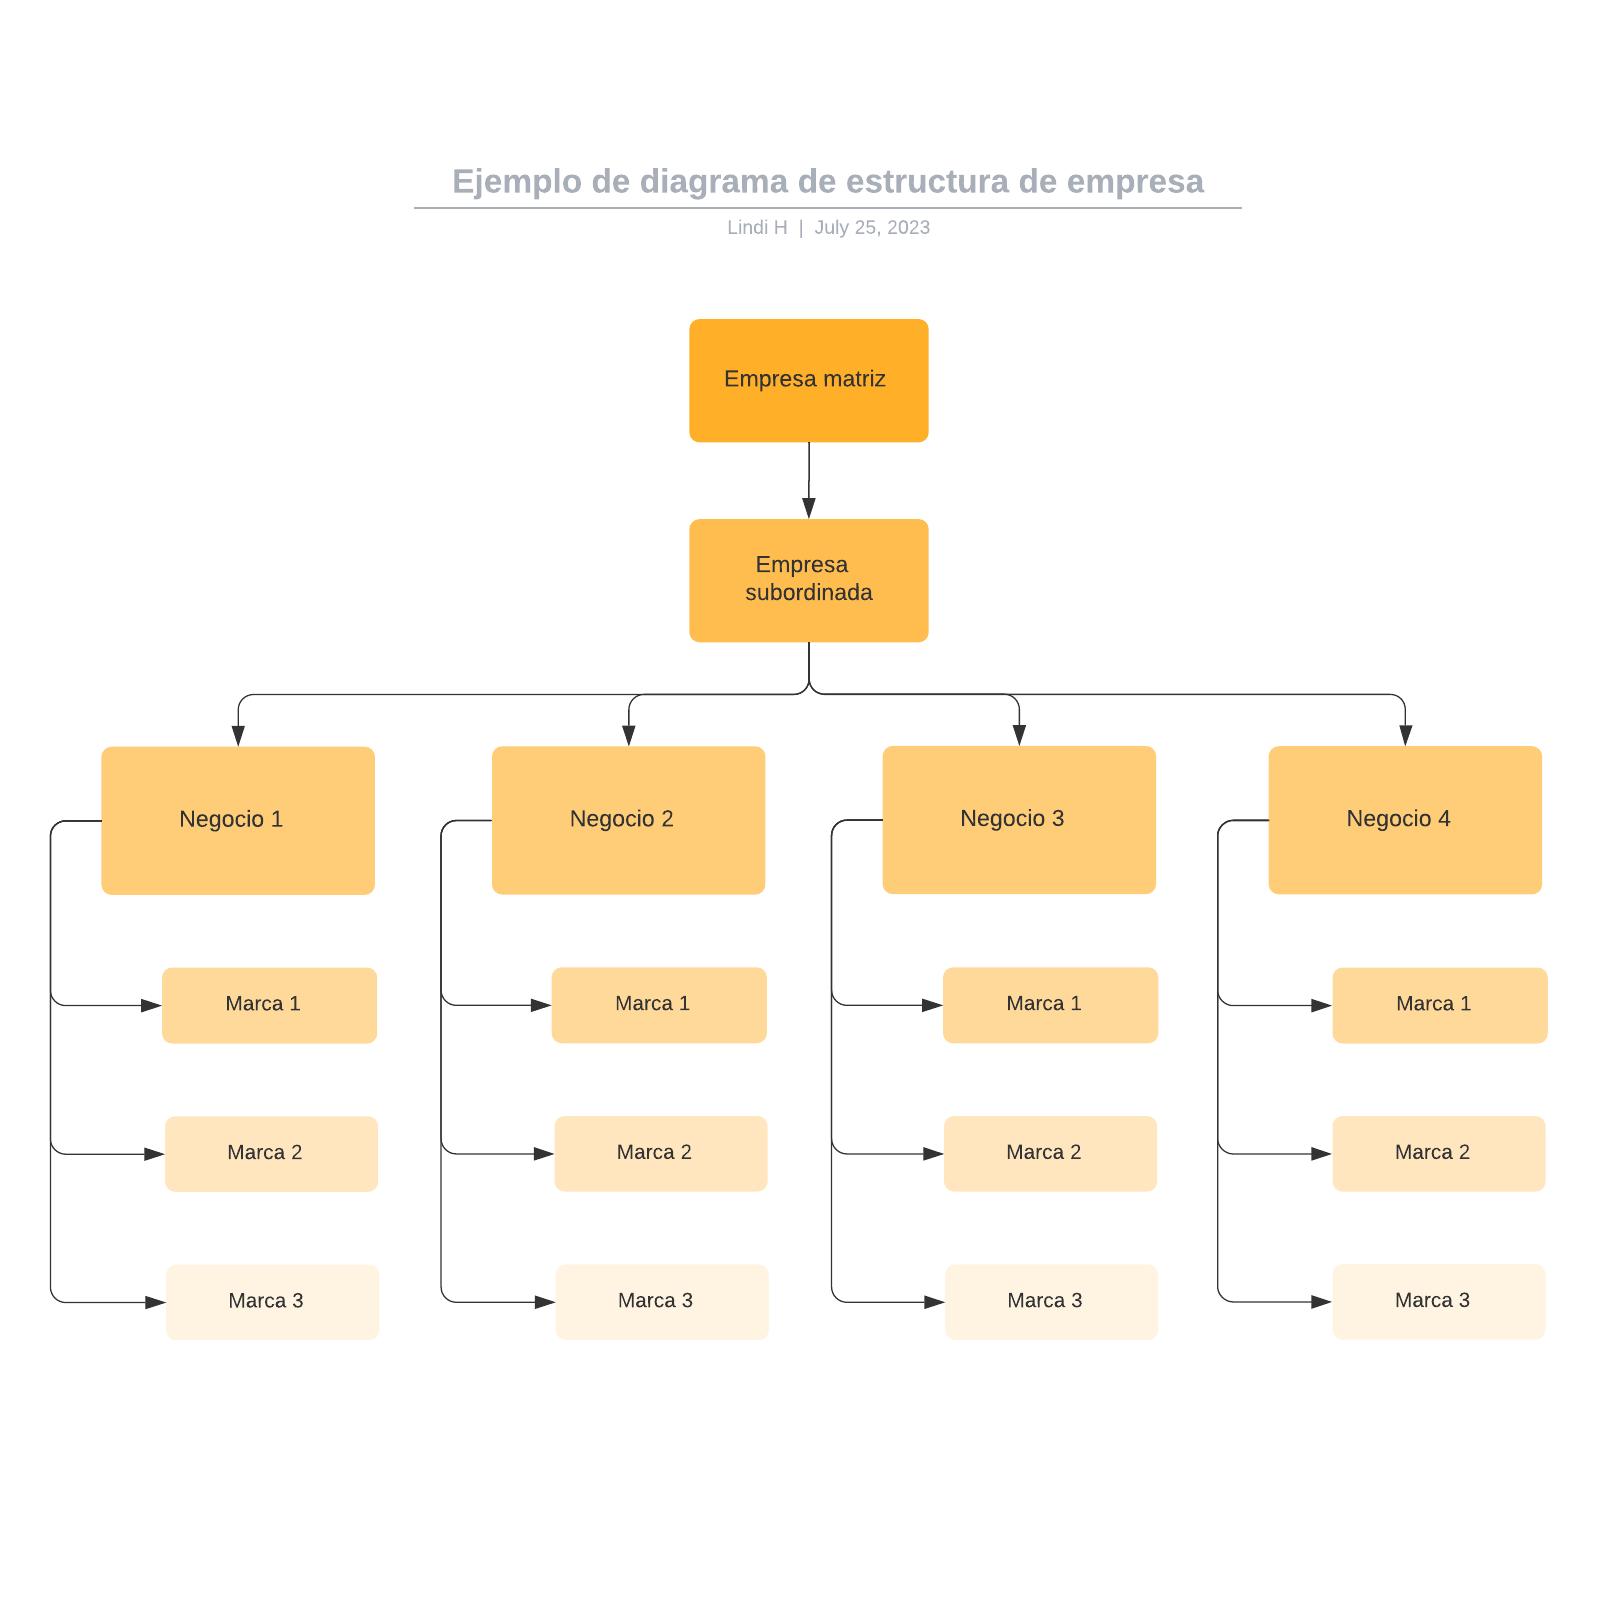 Ejemplo de diagrama de estructura de empresa